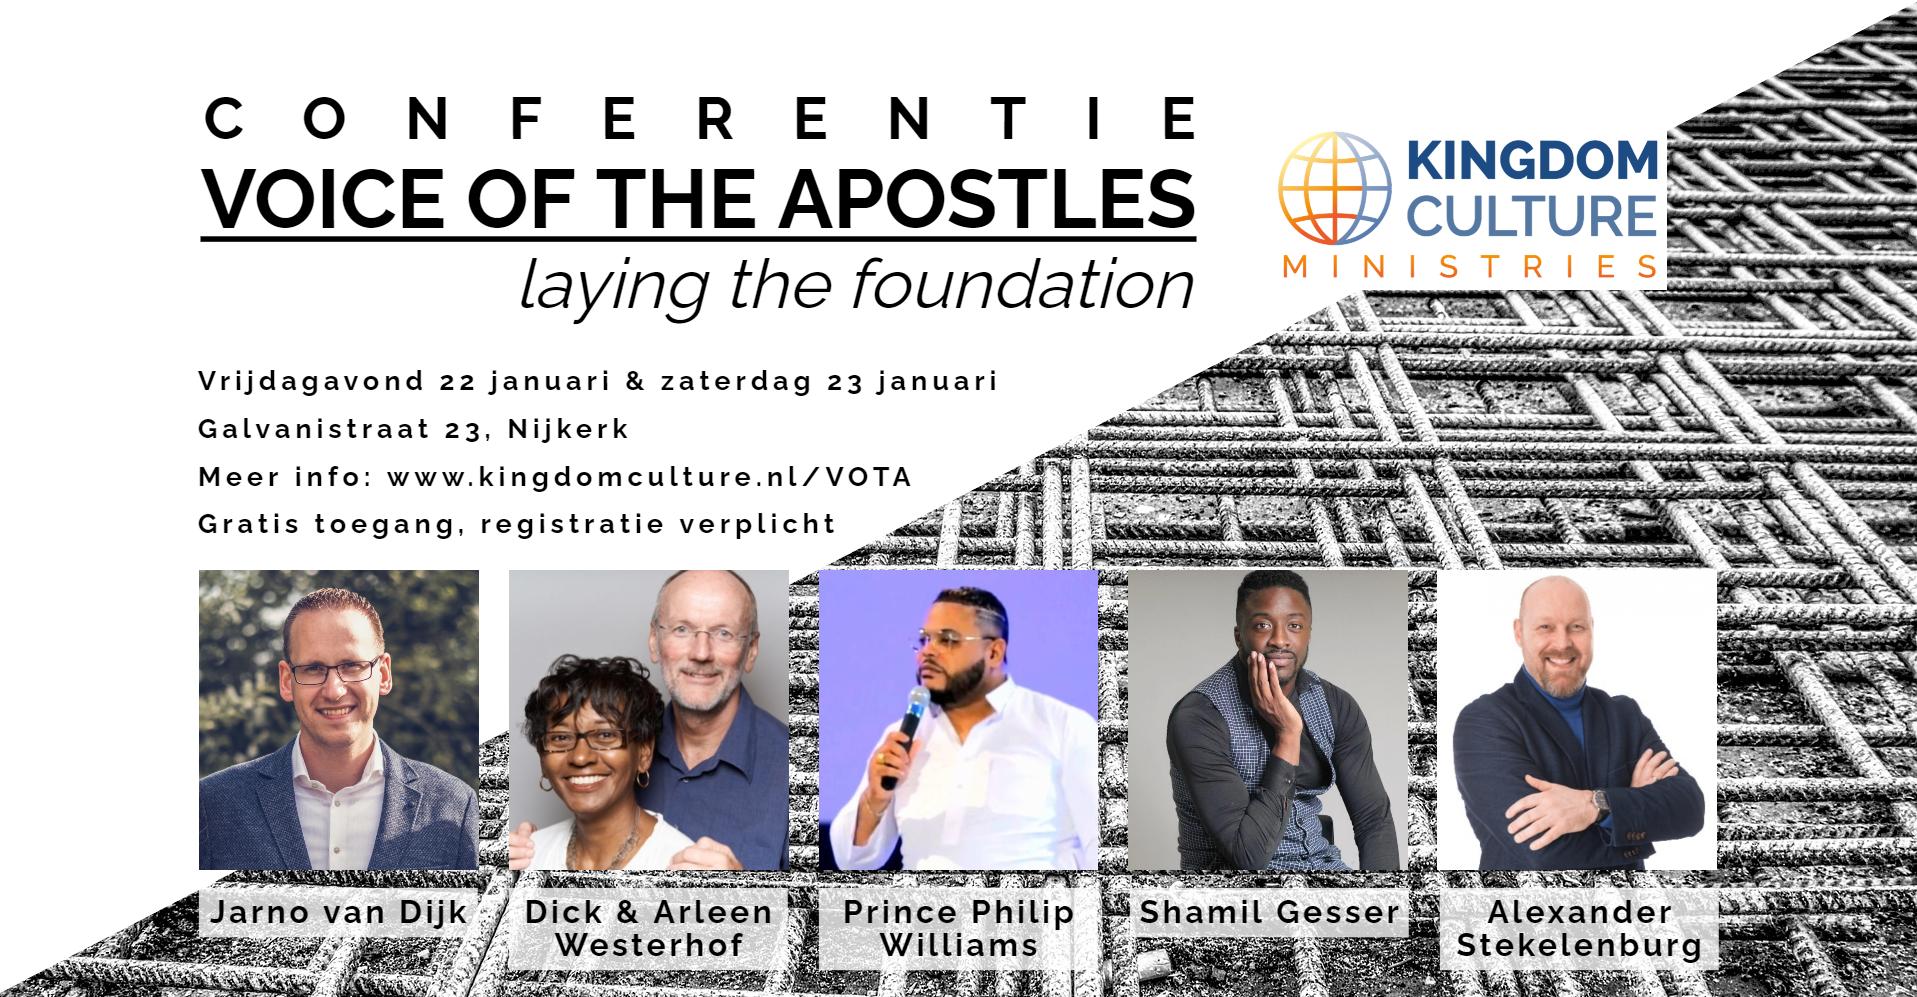 Conferentie Voice of the Apostles